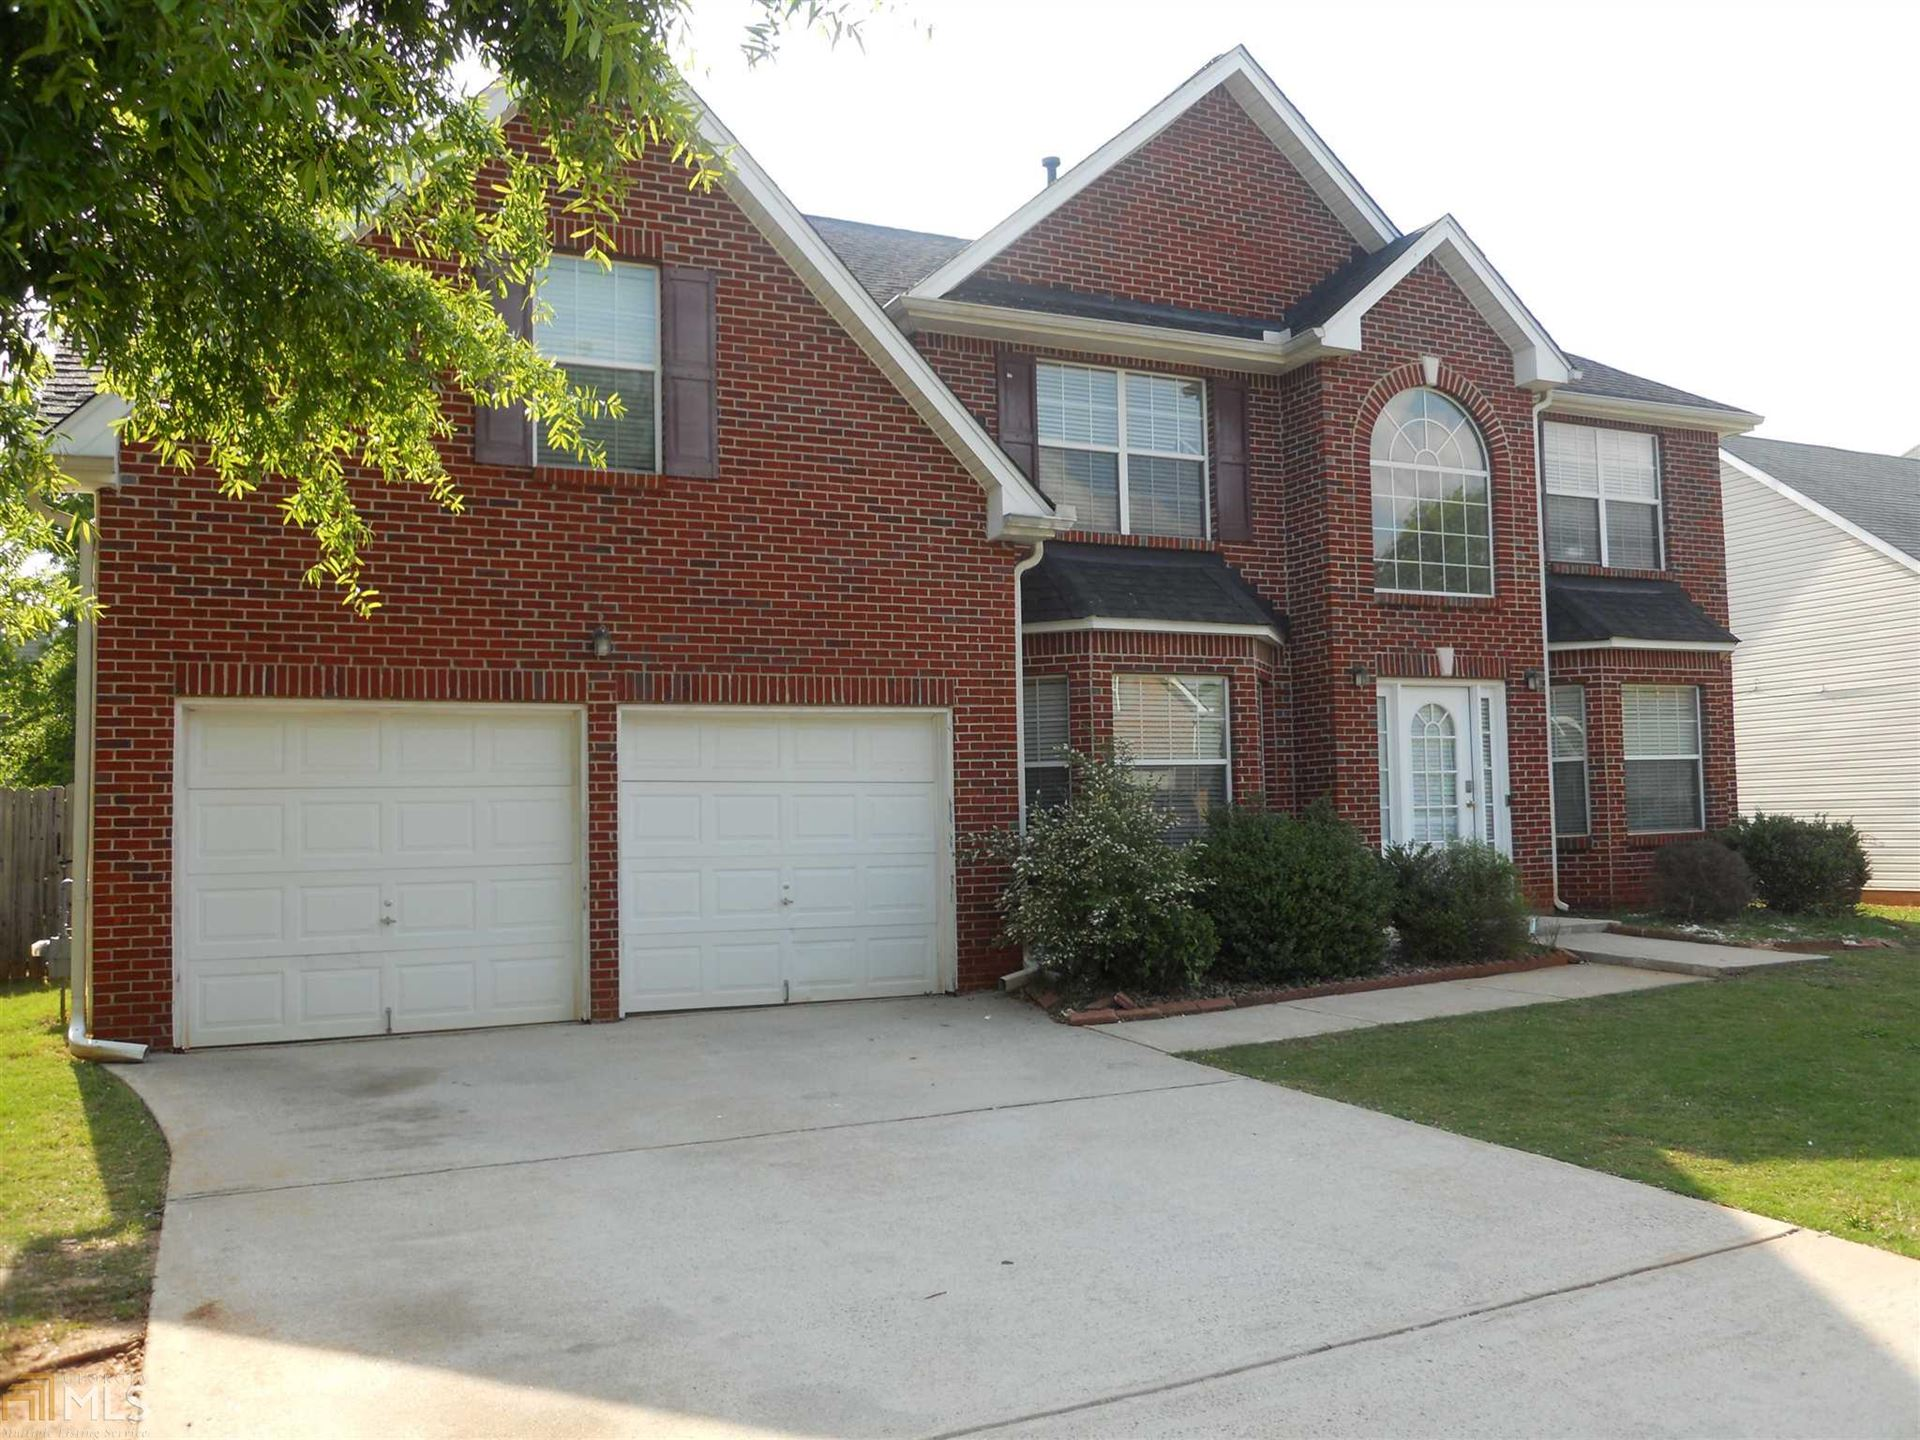 334 Kentwood Springs Dr, Hampton, GA 30228 - #: 8793879